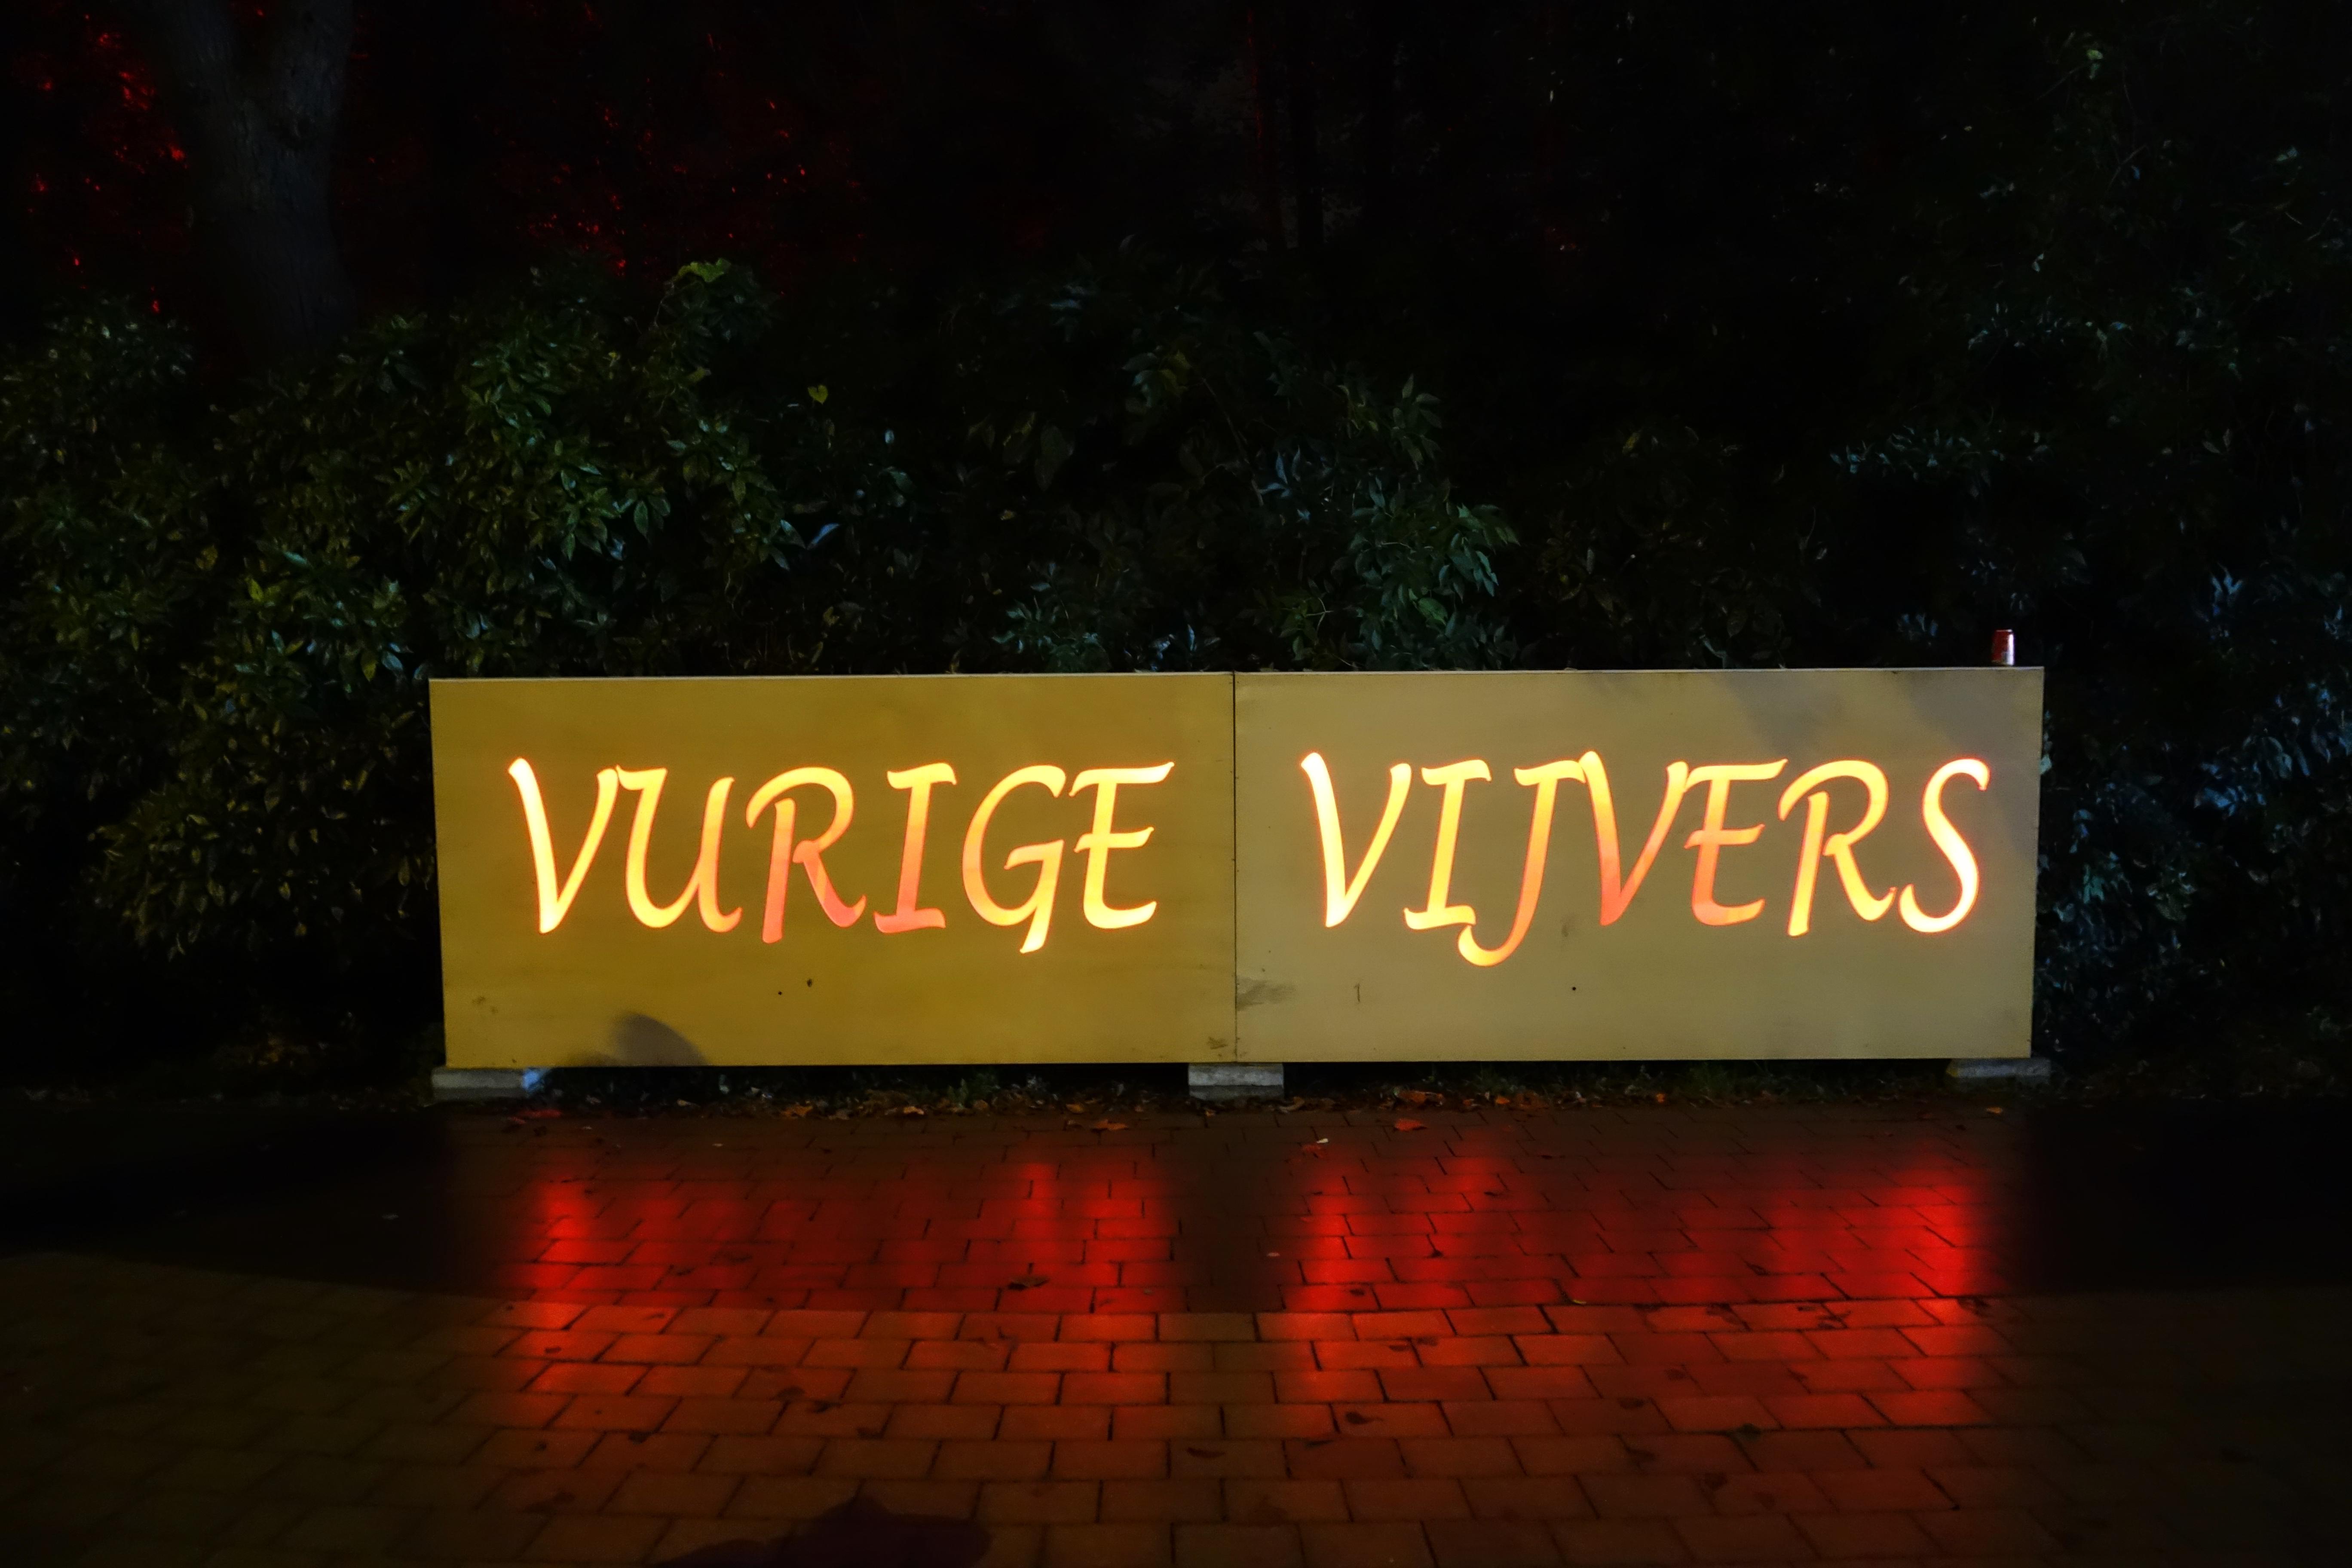 Vurige Vijvers